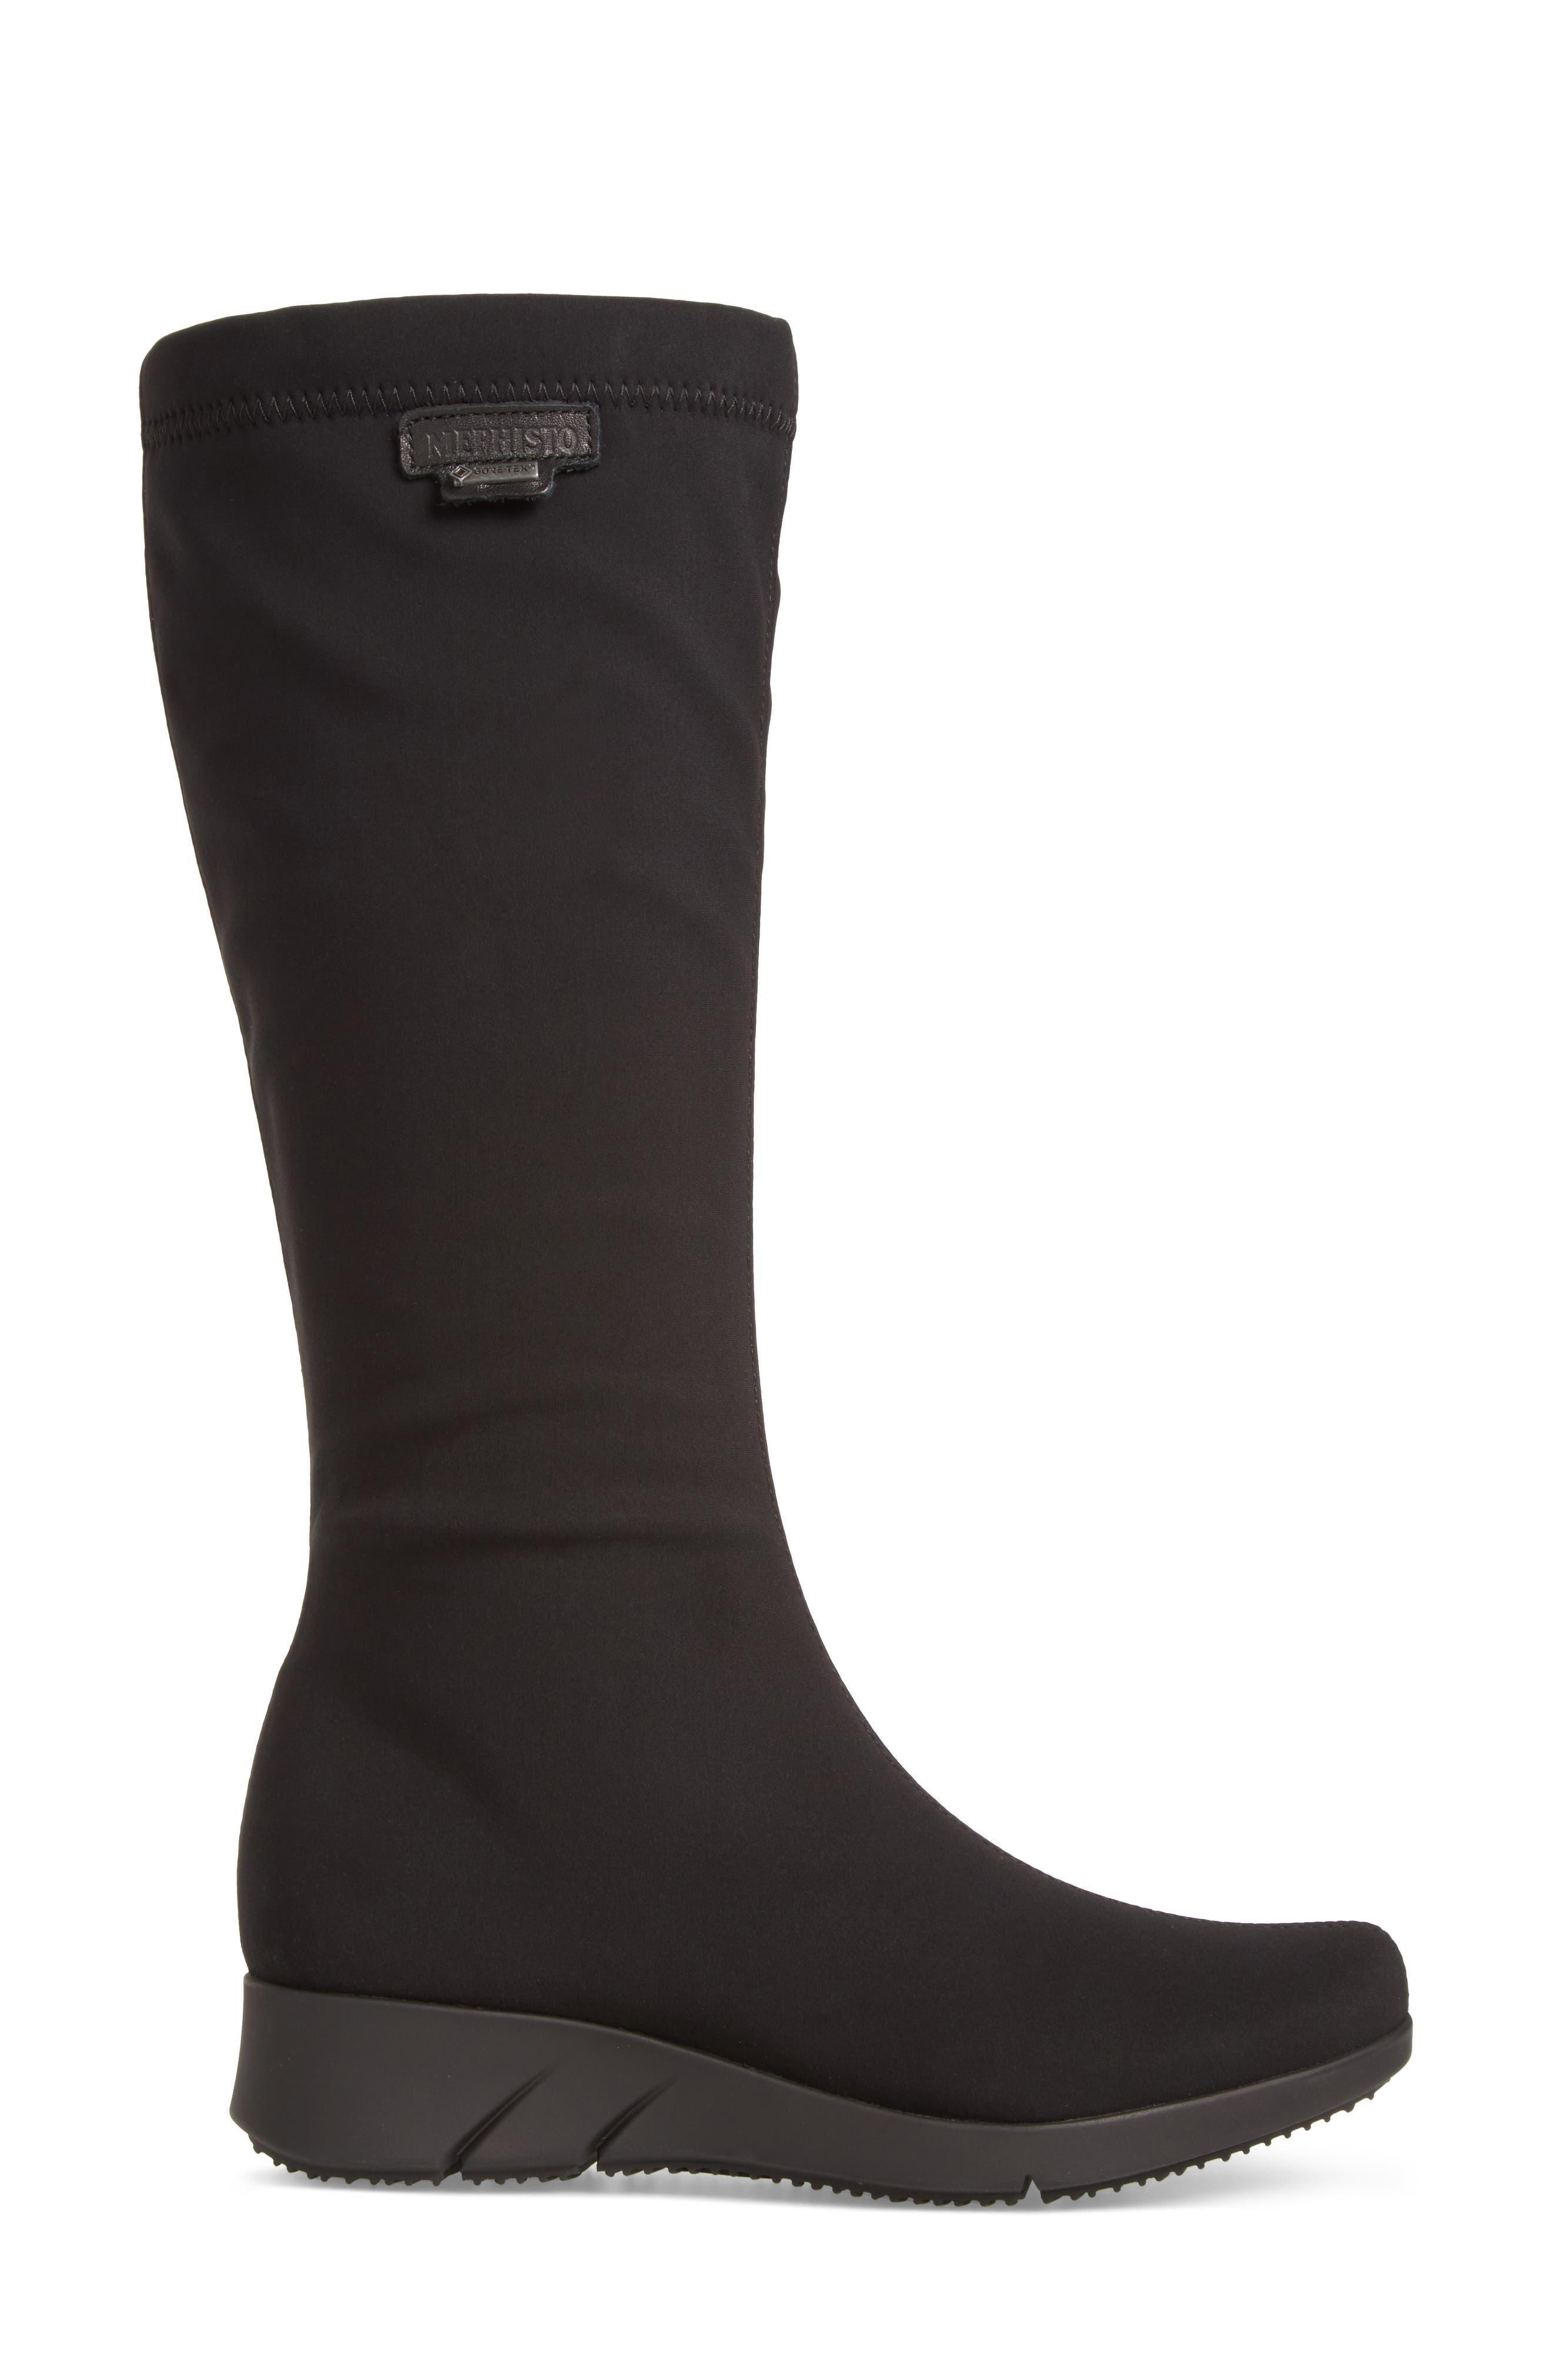 Minda Waterproof Wedge Boot,                             Alternate thumbnail 3, color,                             Black Fabric